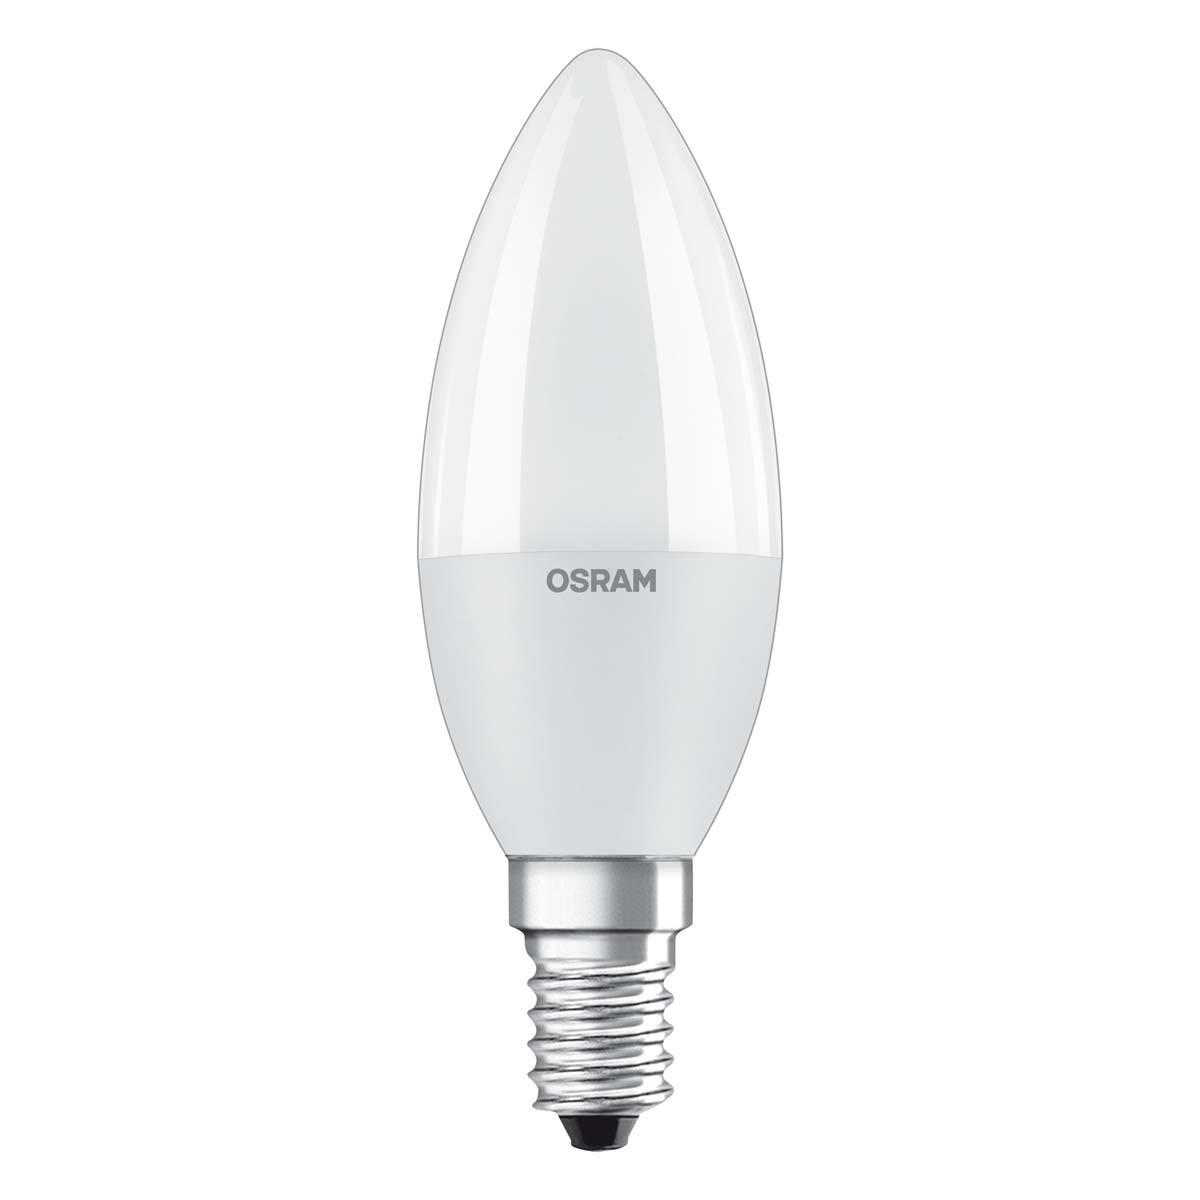 Osram LED SuperStar Classic B Lampe, in Kerzenform mit E14-Sockel, dimmbar, Ersetzt 40 Watt, Matt, Warmweiß - 2700 Kelvin, 1er-Pack Ledvance 4052899904415